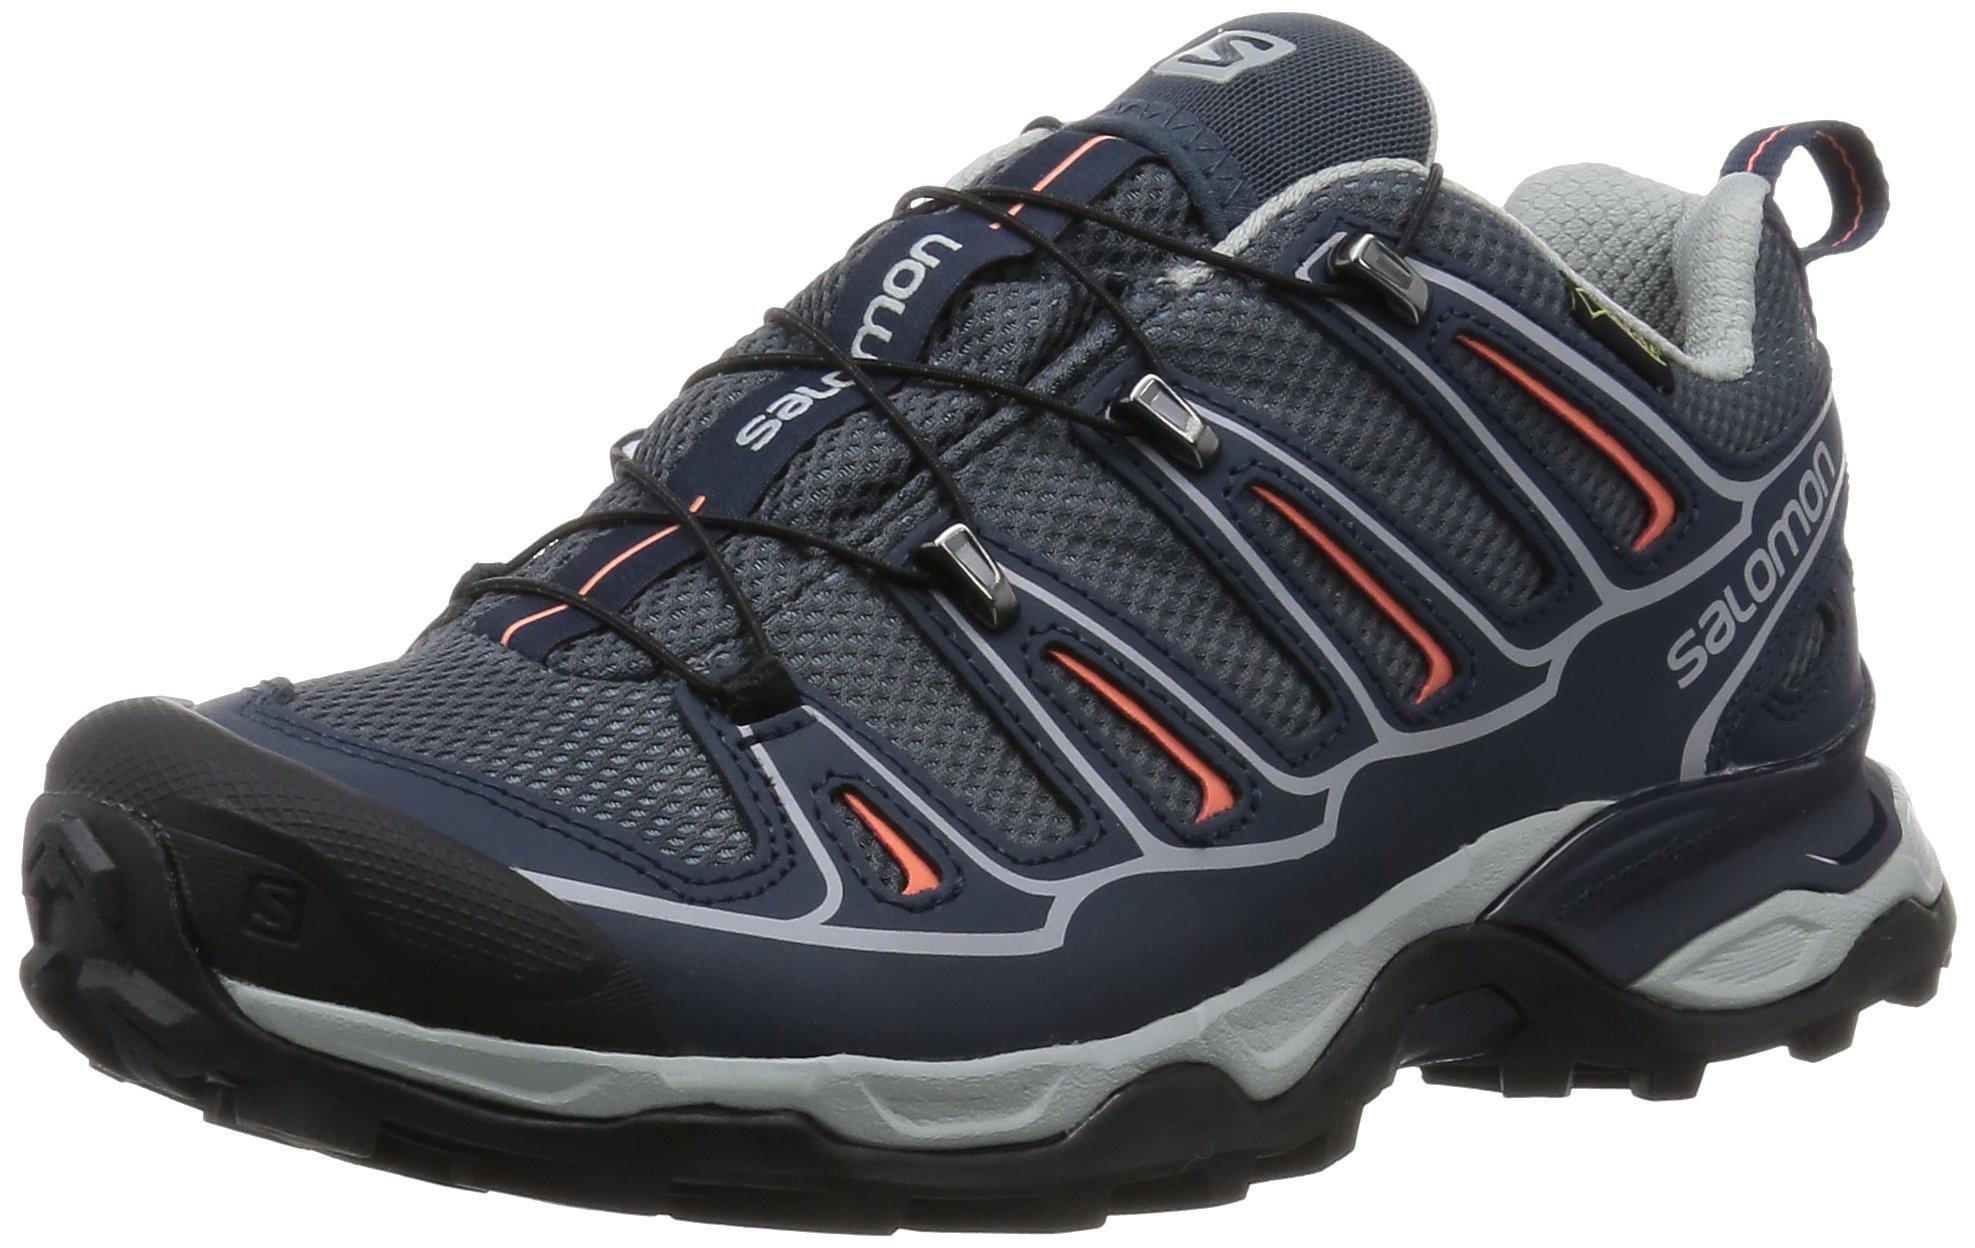 Salomon Women's X Ultra 2 GTX W Hiking Shoe, Grey Denim/Deep Blue/Melon Bloom, 9 M US